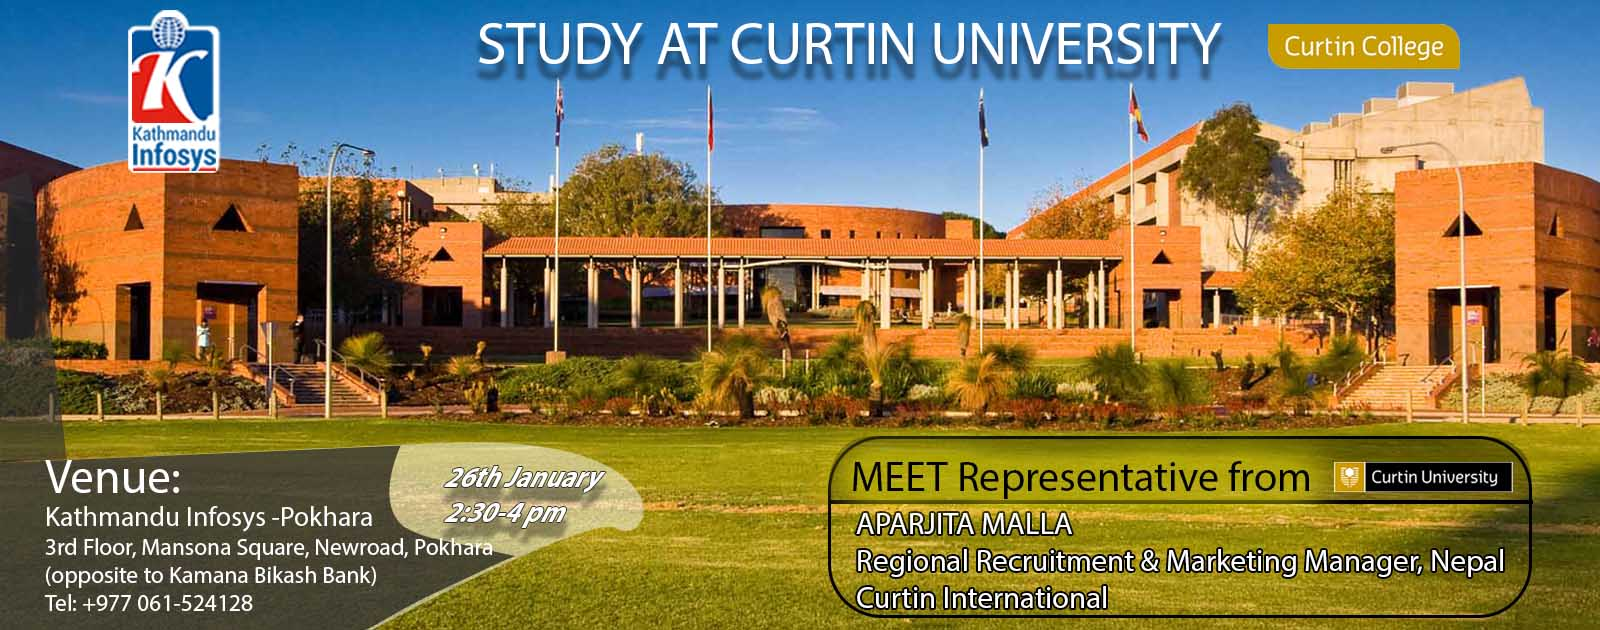 Curtin Facebook Banner